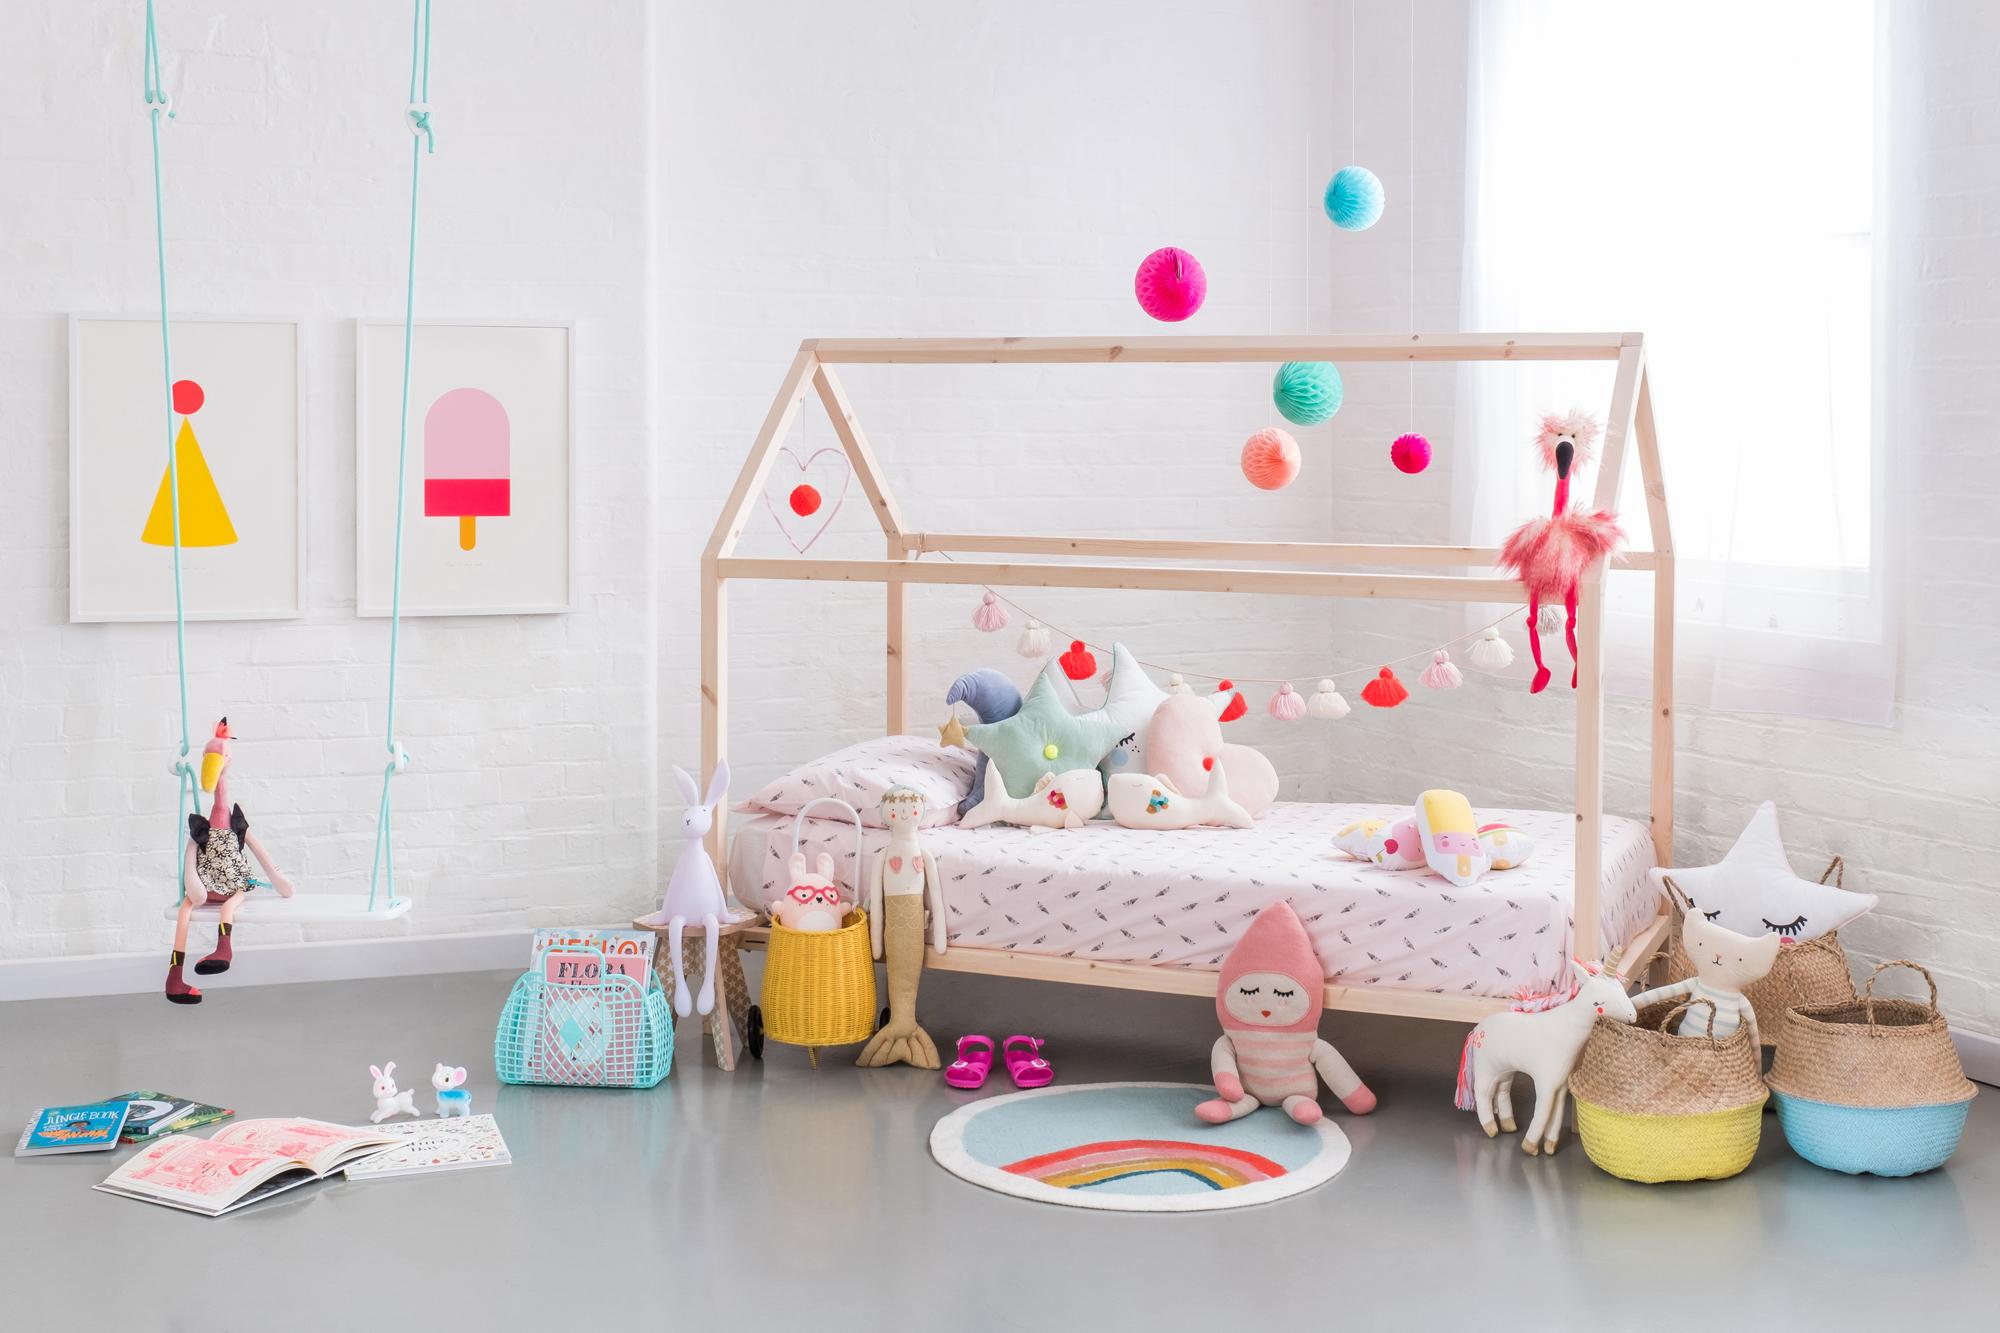 girls furniture slide bed marvelous bunk kids childrens with children ideas bedroom and s beds slides